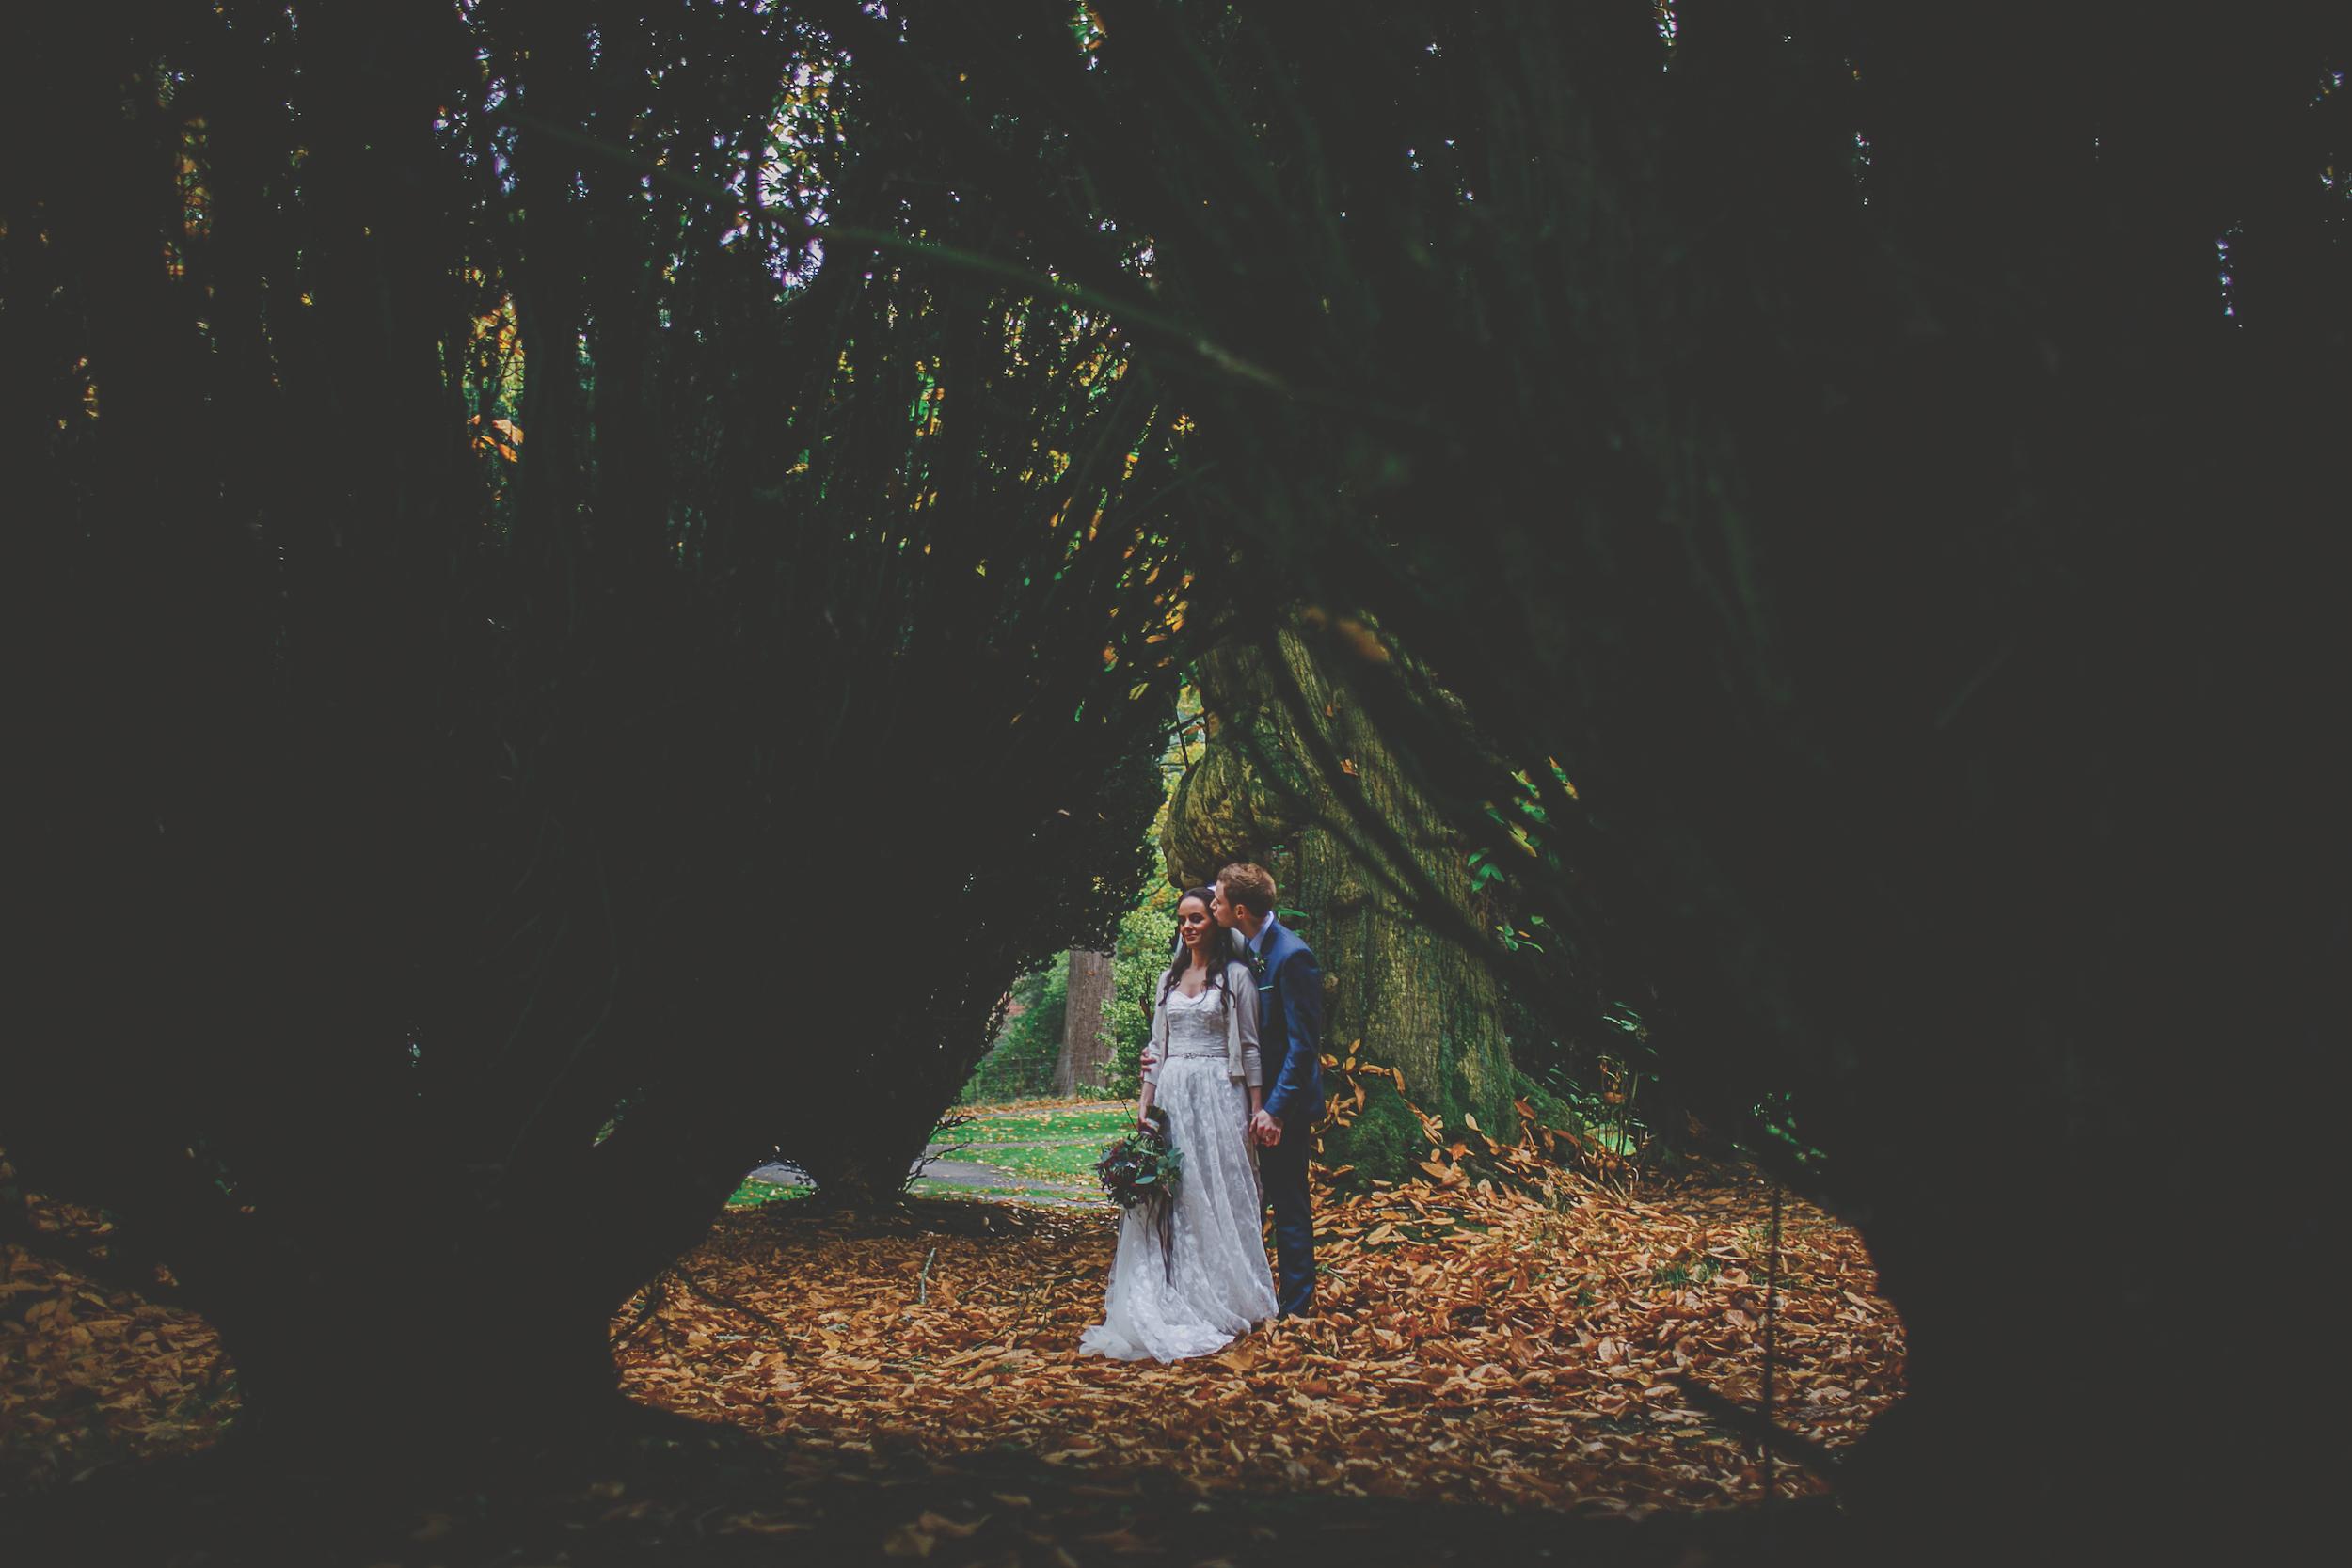 gather_and_tides_wedding_photographer_larchfield_autumn_northern_ireland_Wedding_inspire_Weddings_7.jpeg